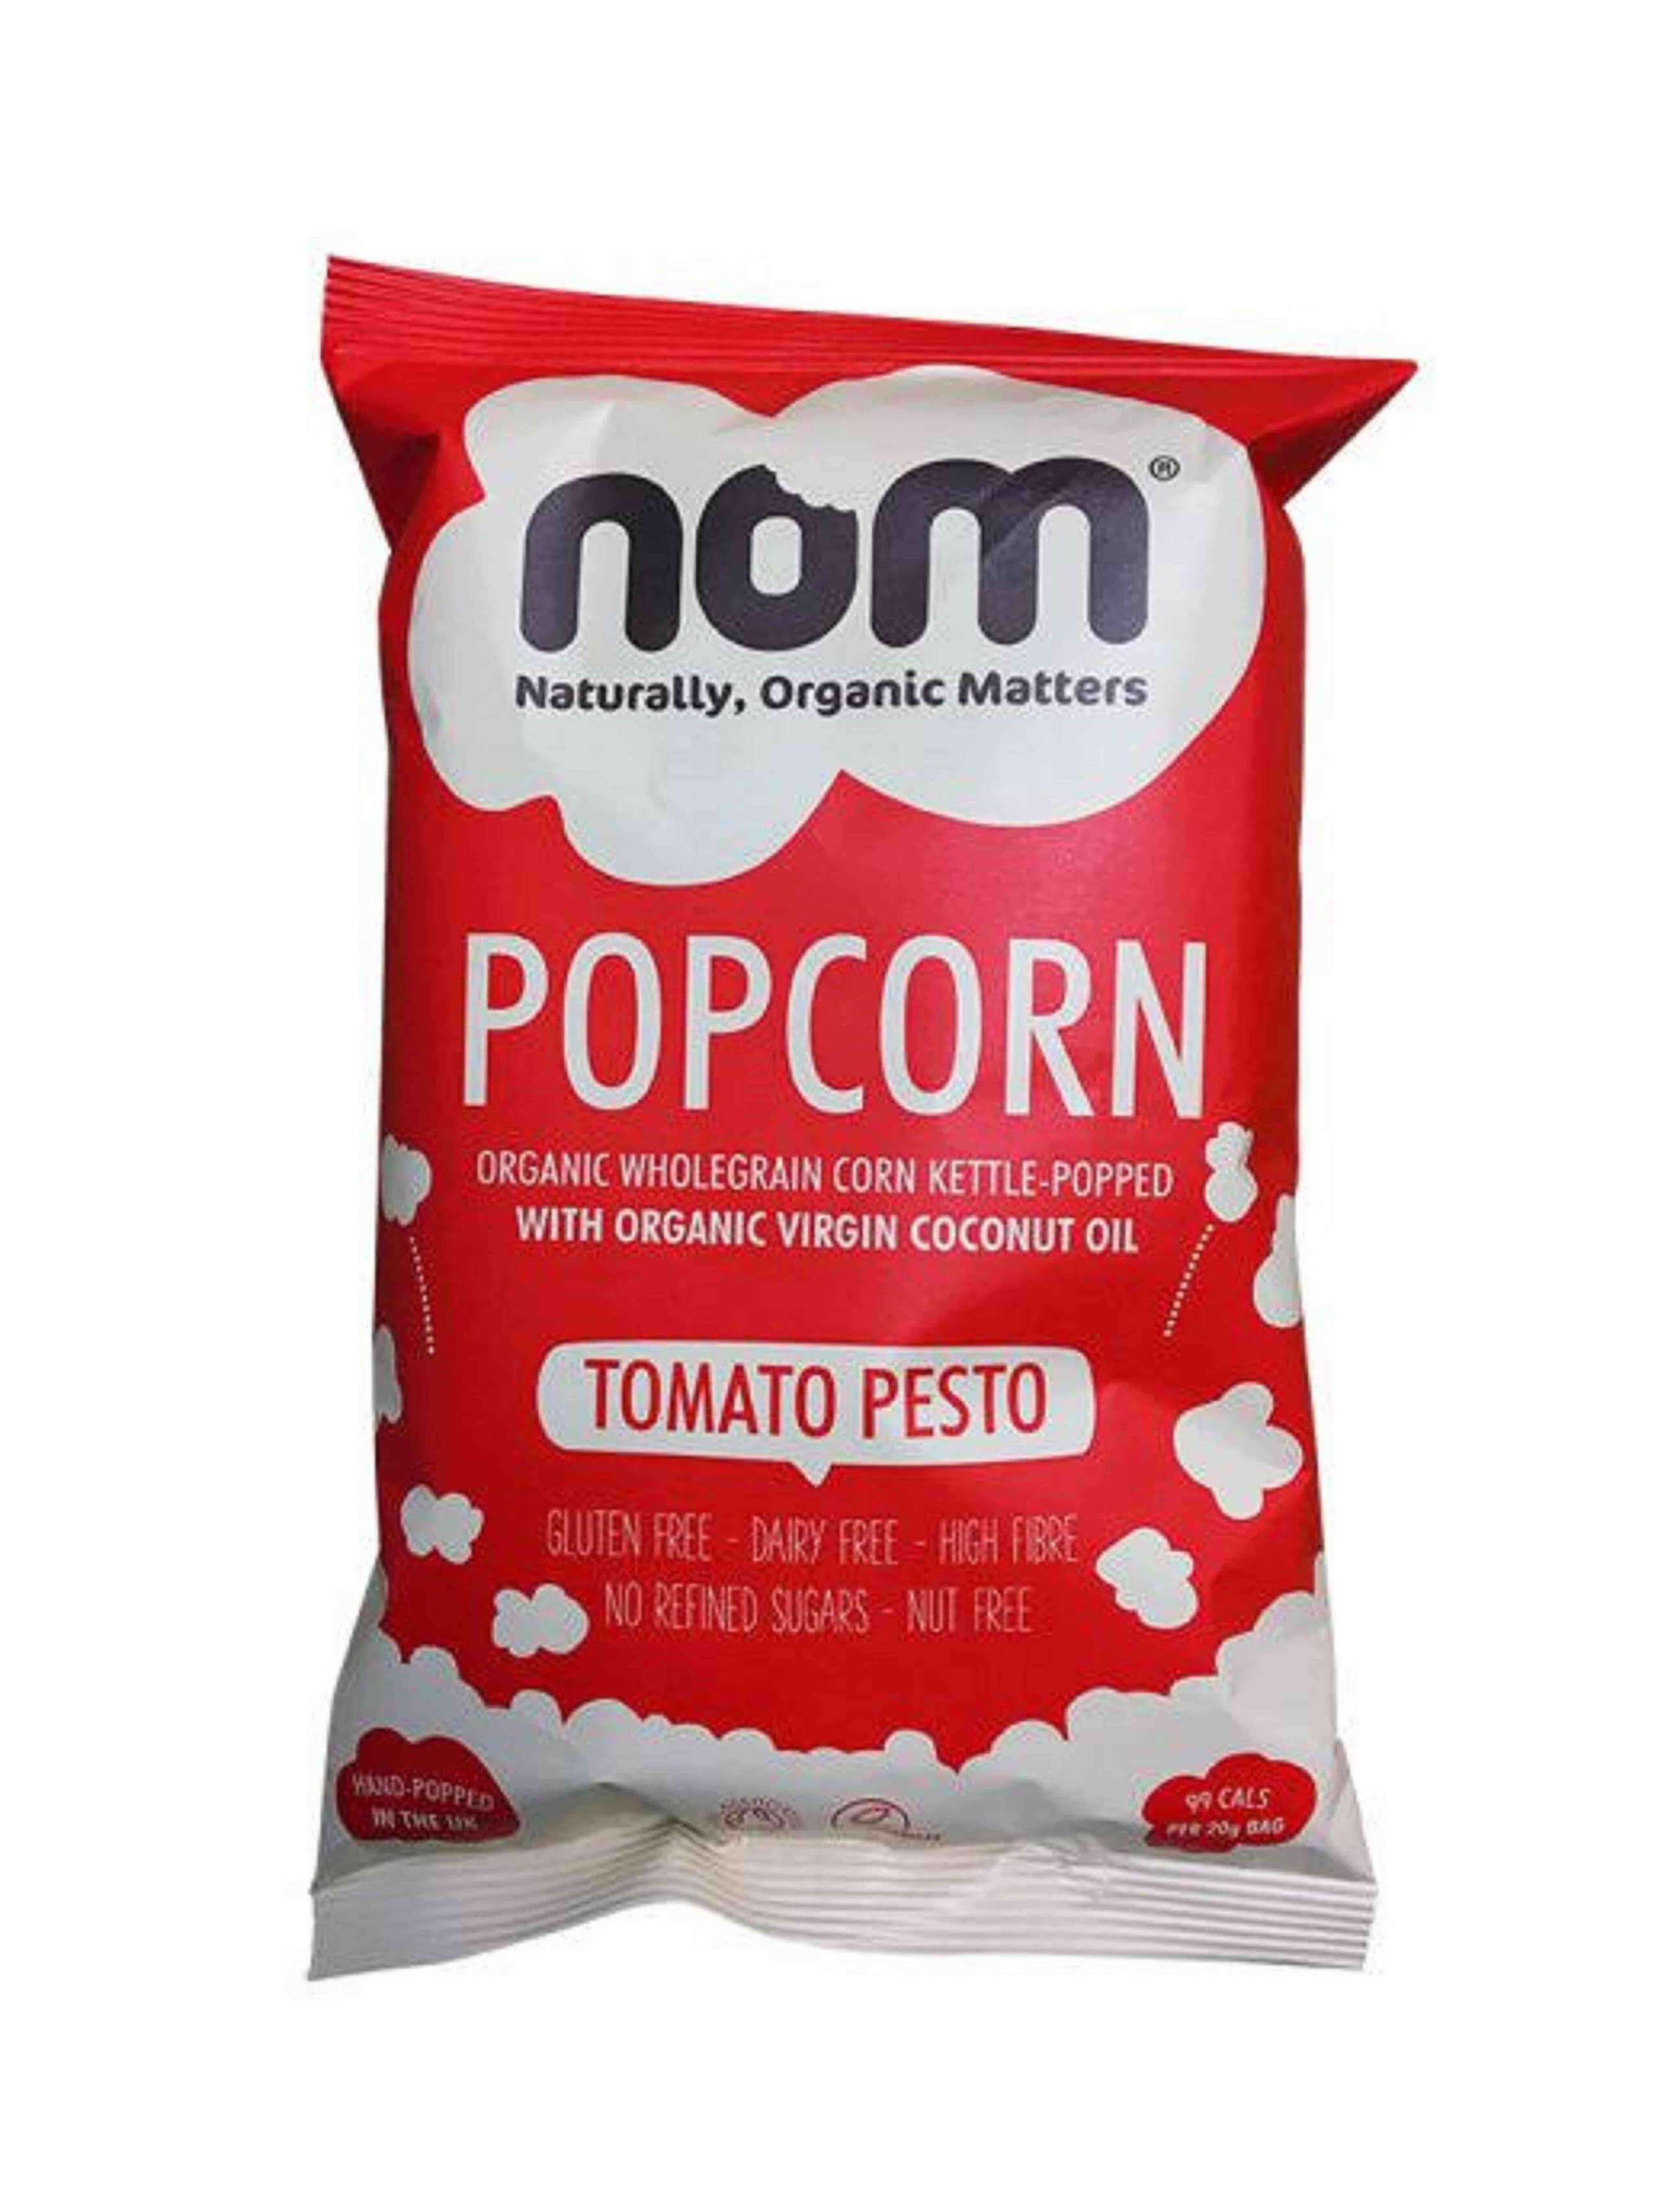 nom-tomato-pesto-popcorn-rrp-1-49-per-bag